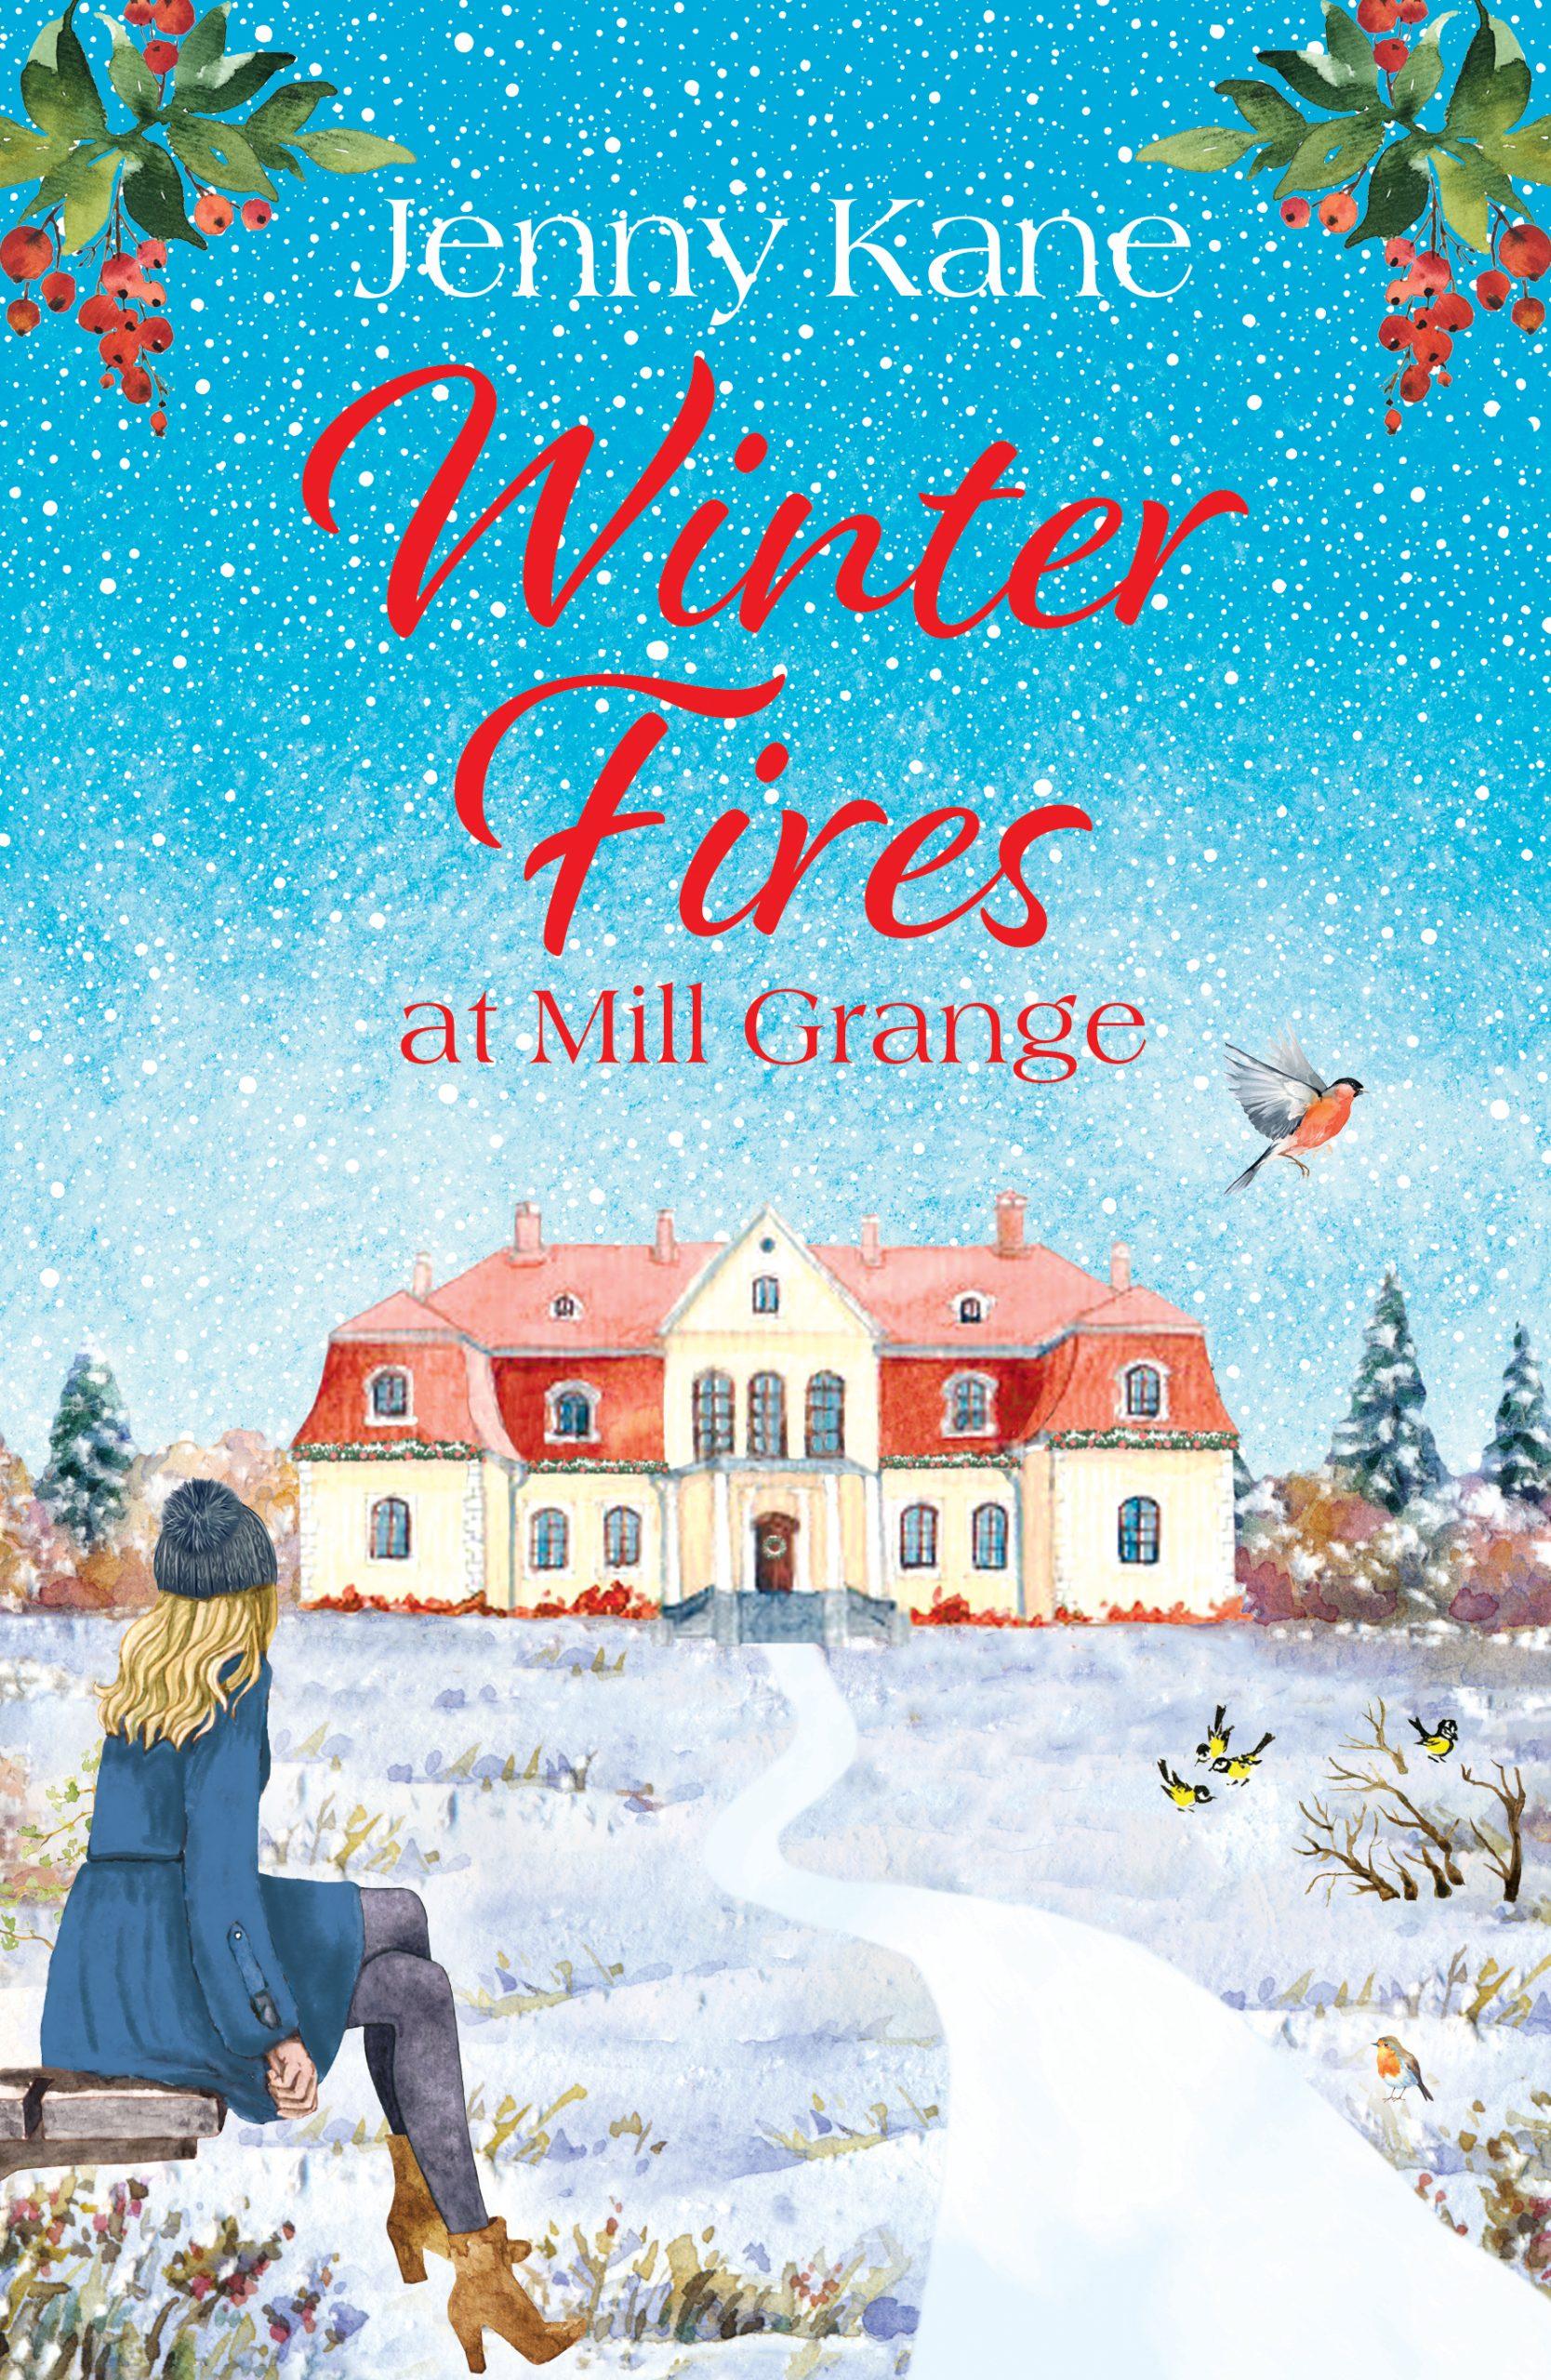 Winter Fires at Mill Grange